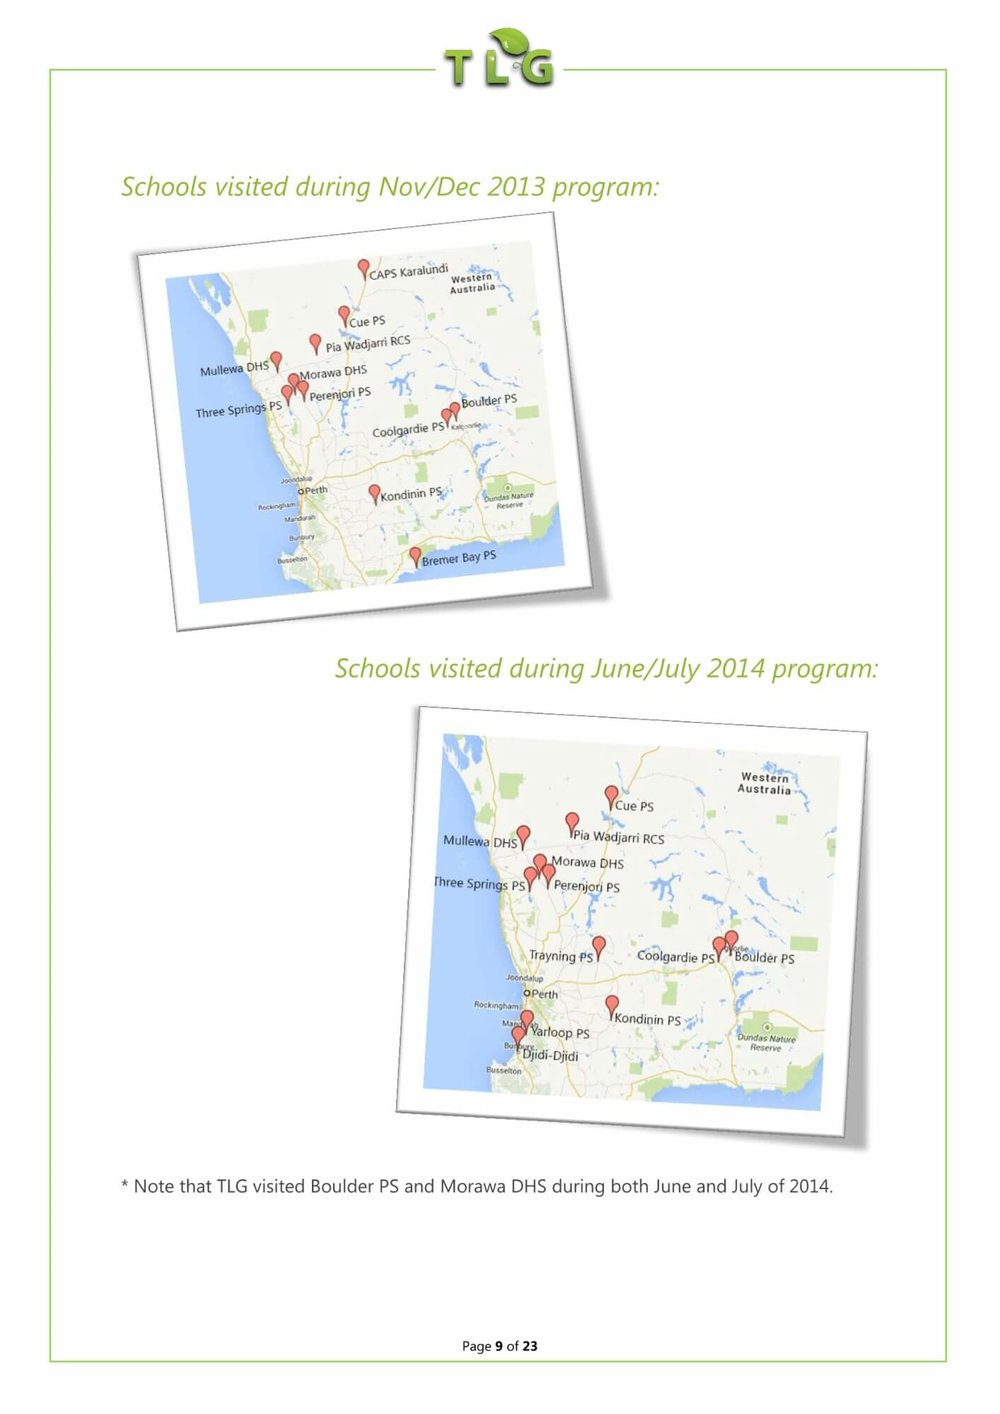 tlg-annual-report-FY13-09.jpg